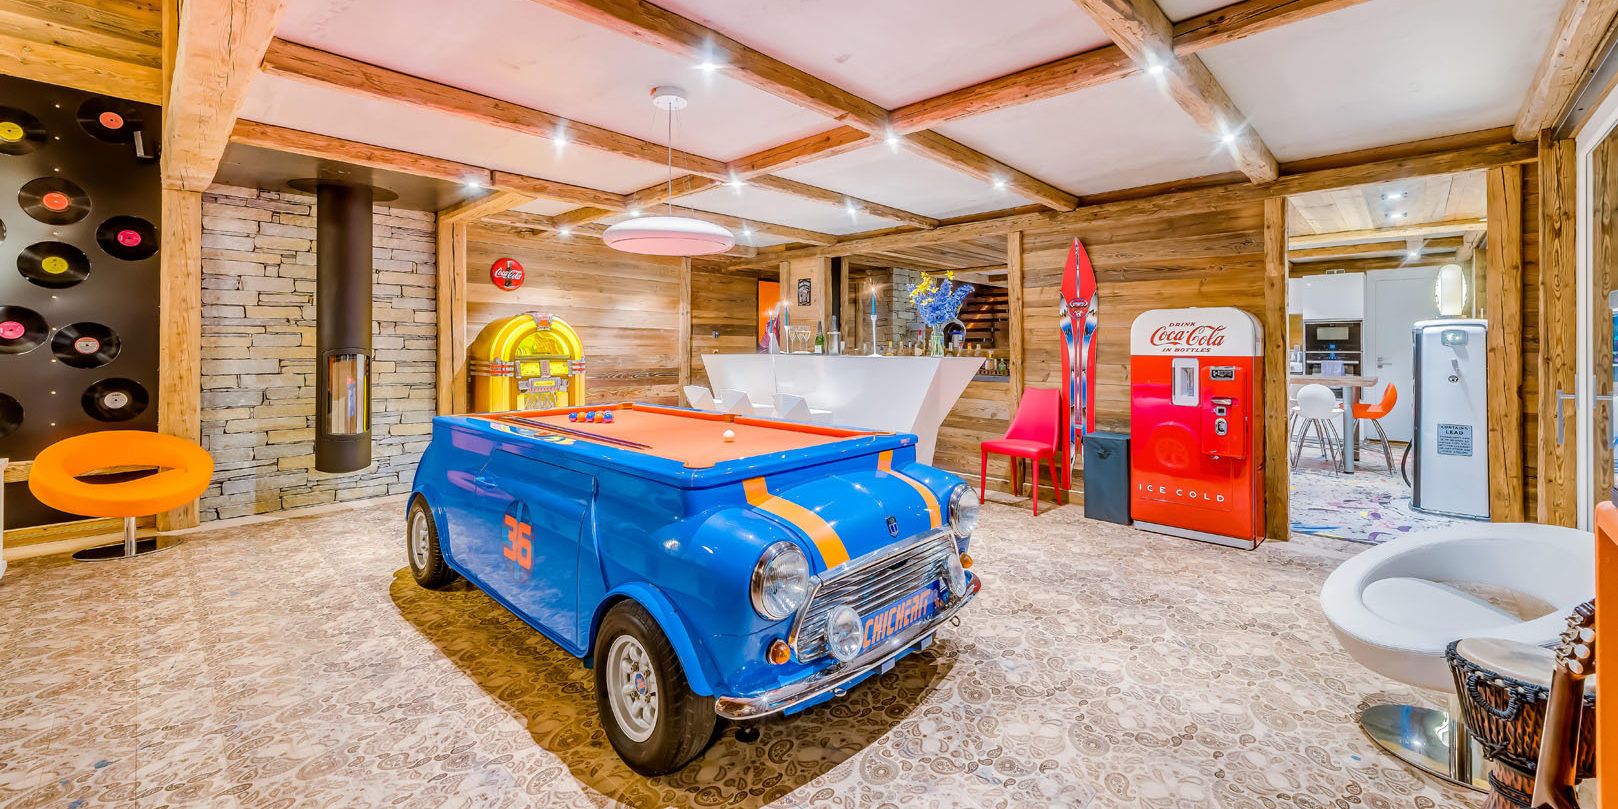 Chalet Rock'n Love Tignes Tignes-Val d'Isere Frankrijk wintersport skivakantie luxe living mini cooper pooltafel lp jukebox bar pomp keuken Coca Cola